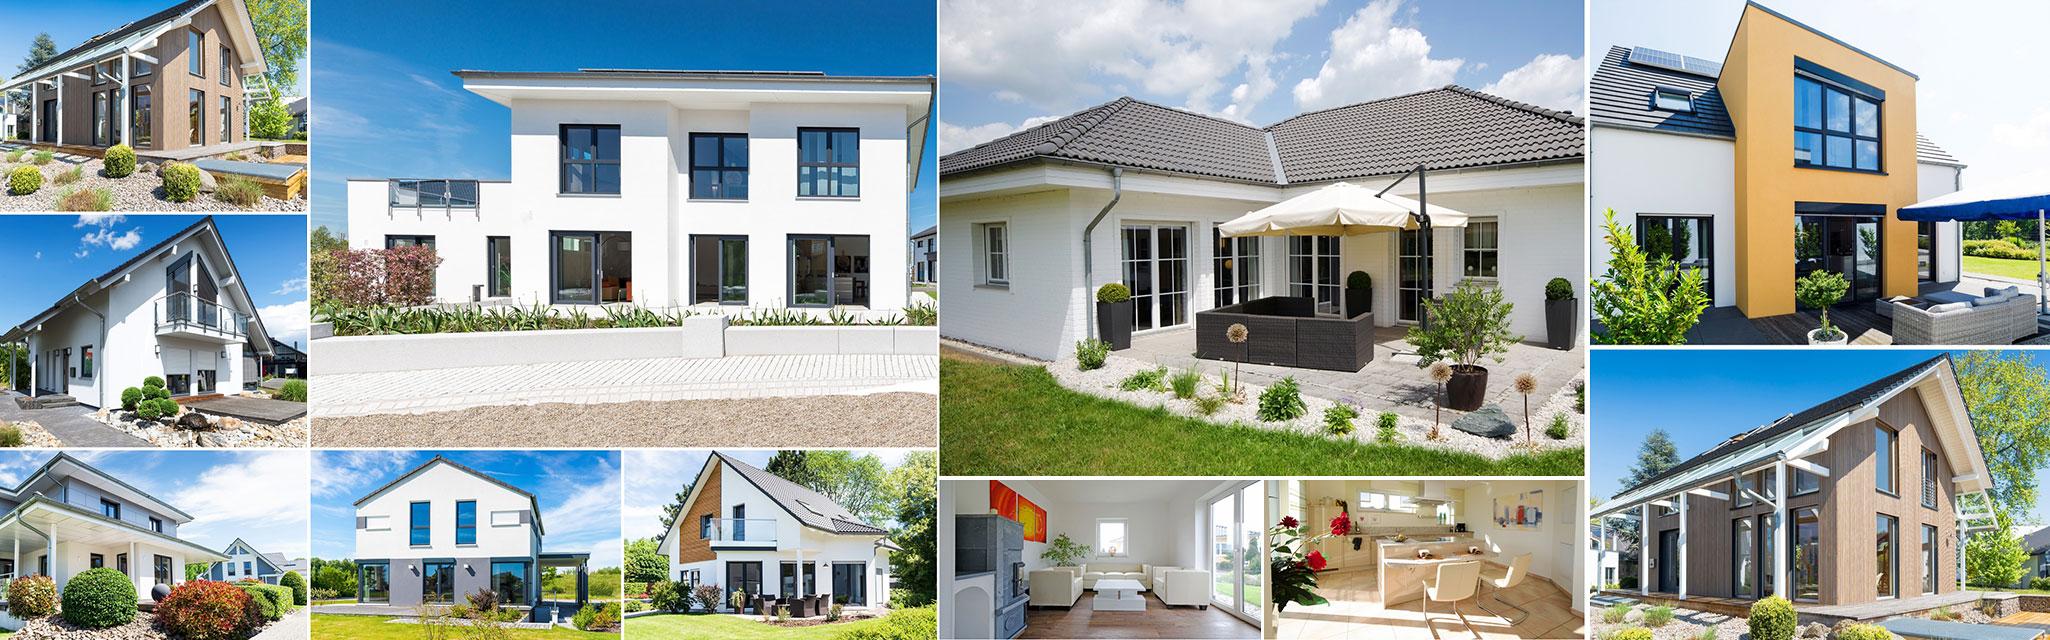 Immobilien 8356604114vermietet Dessau Nord 72 Qm 3 Raum